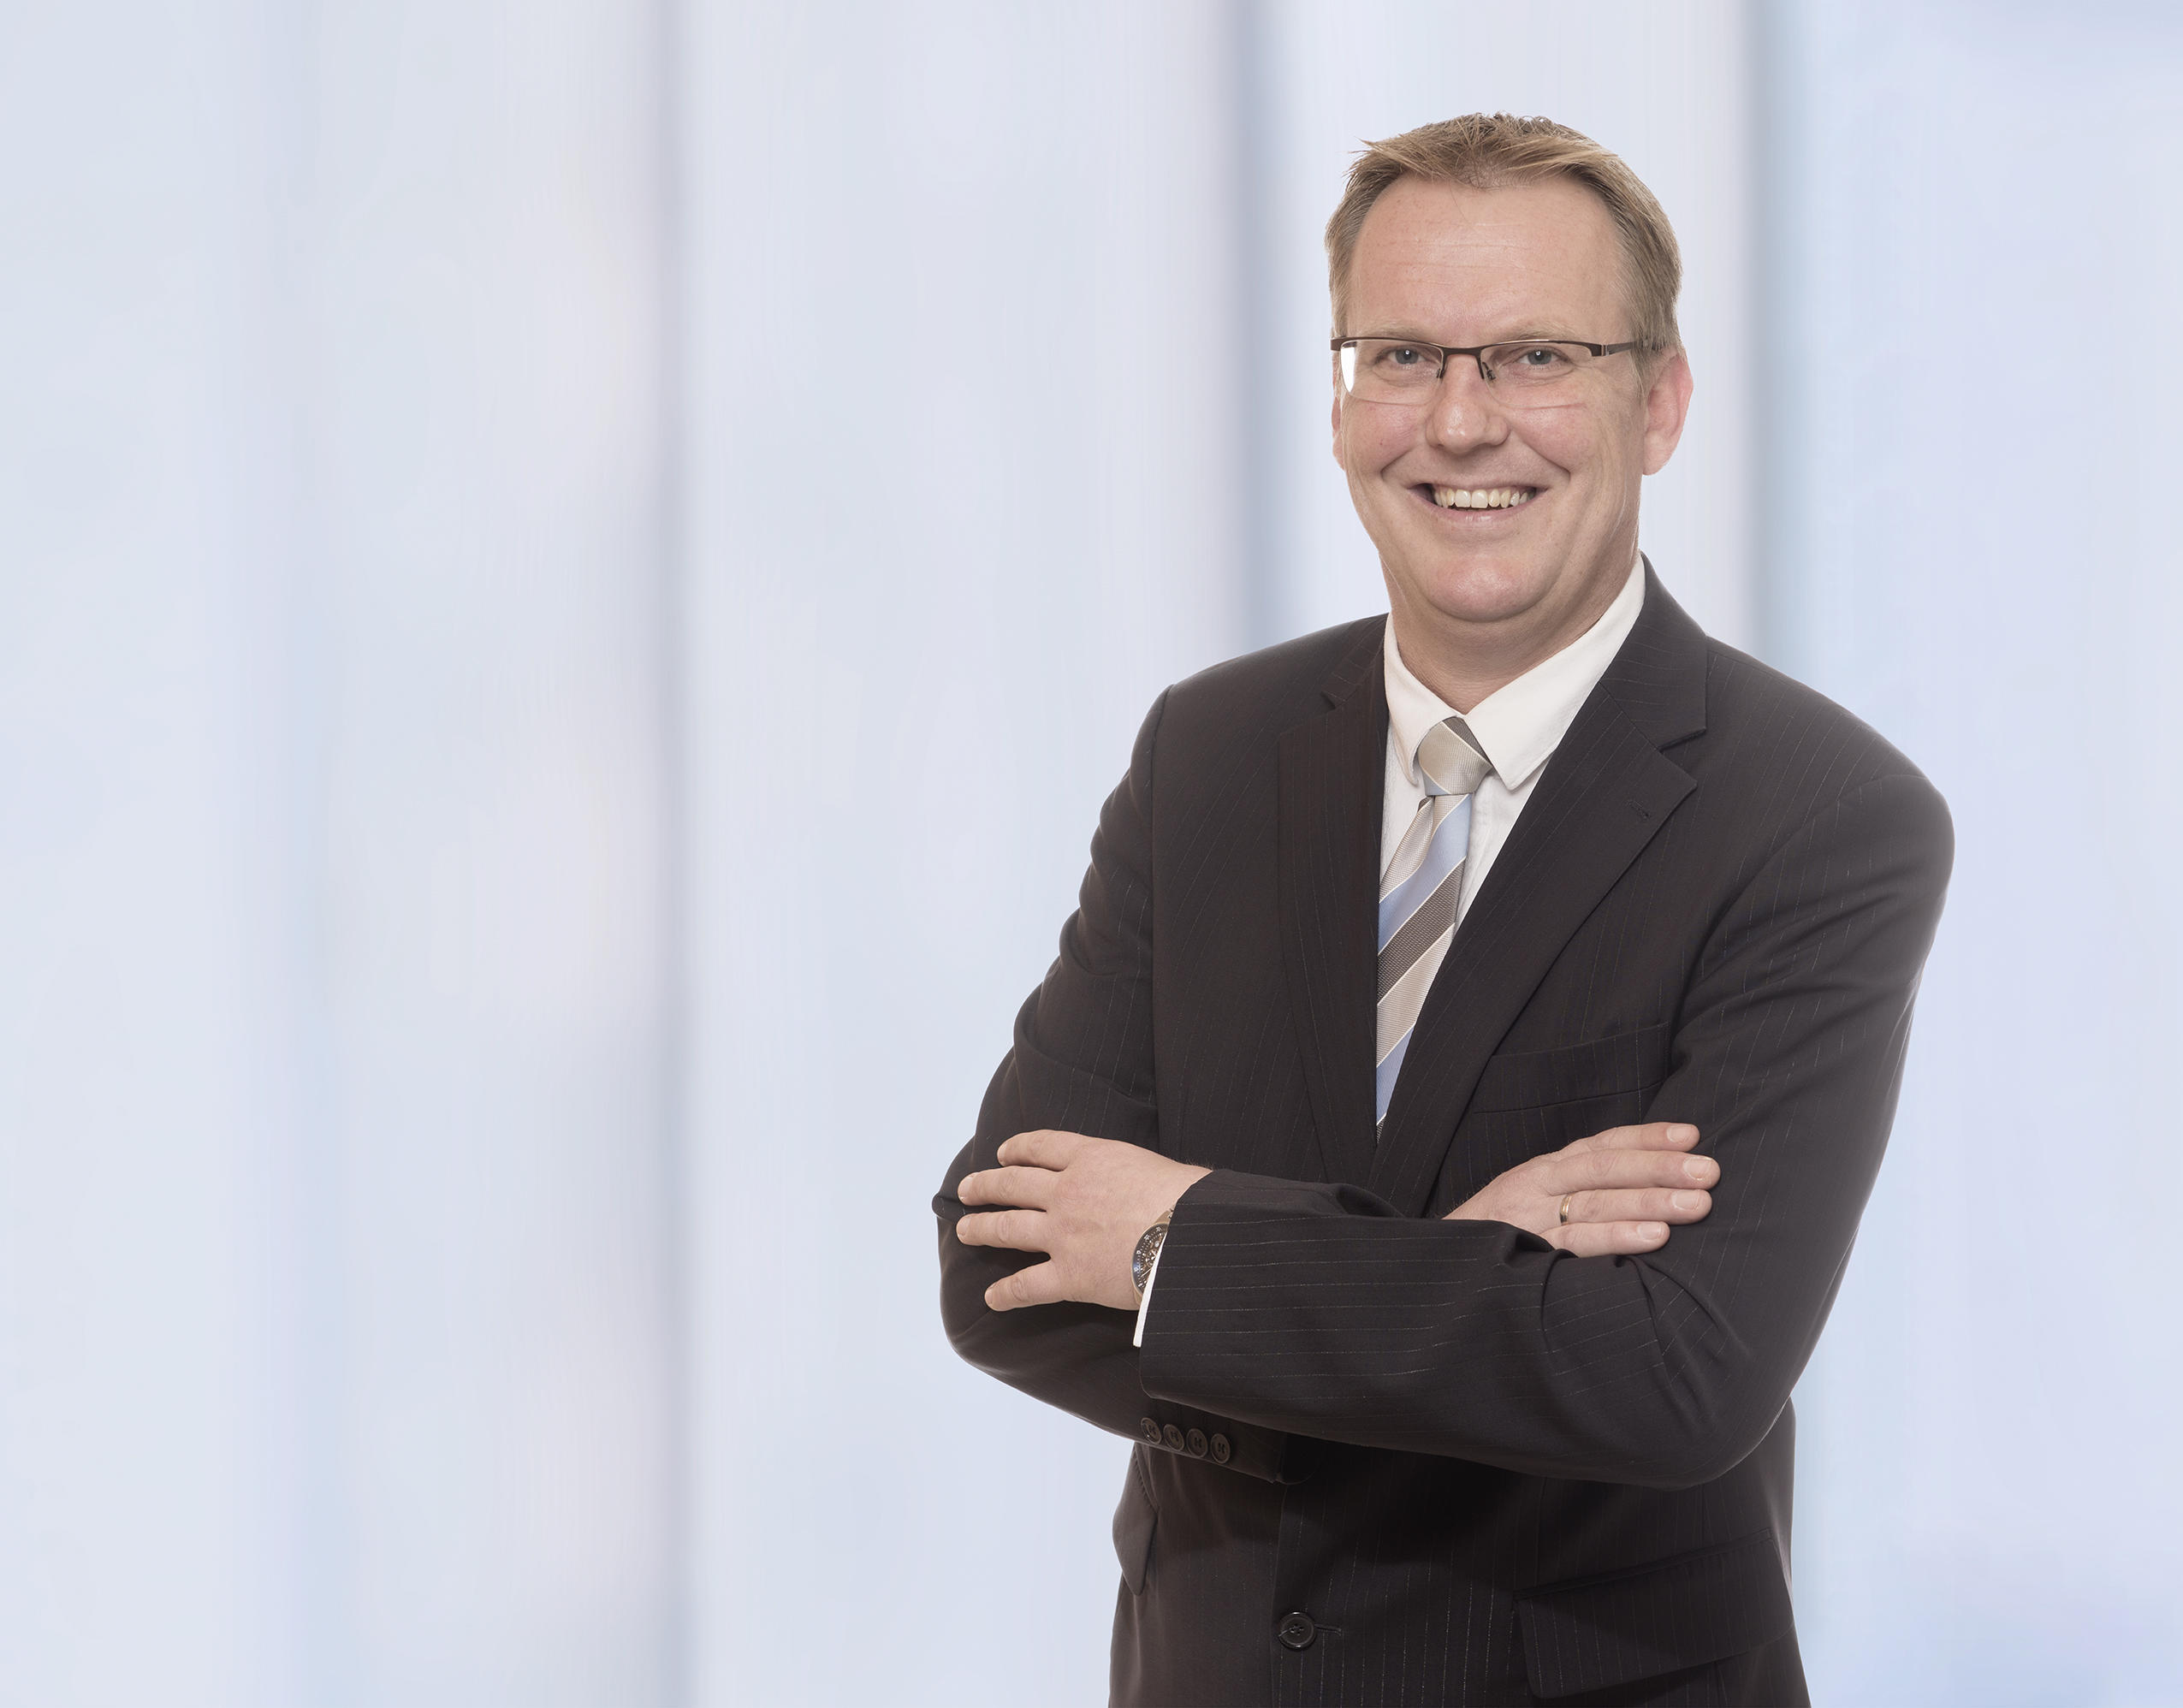 Barmenia Versicherung - Bernd Konrad Eckstein